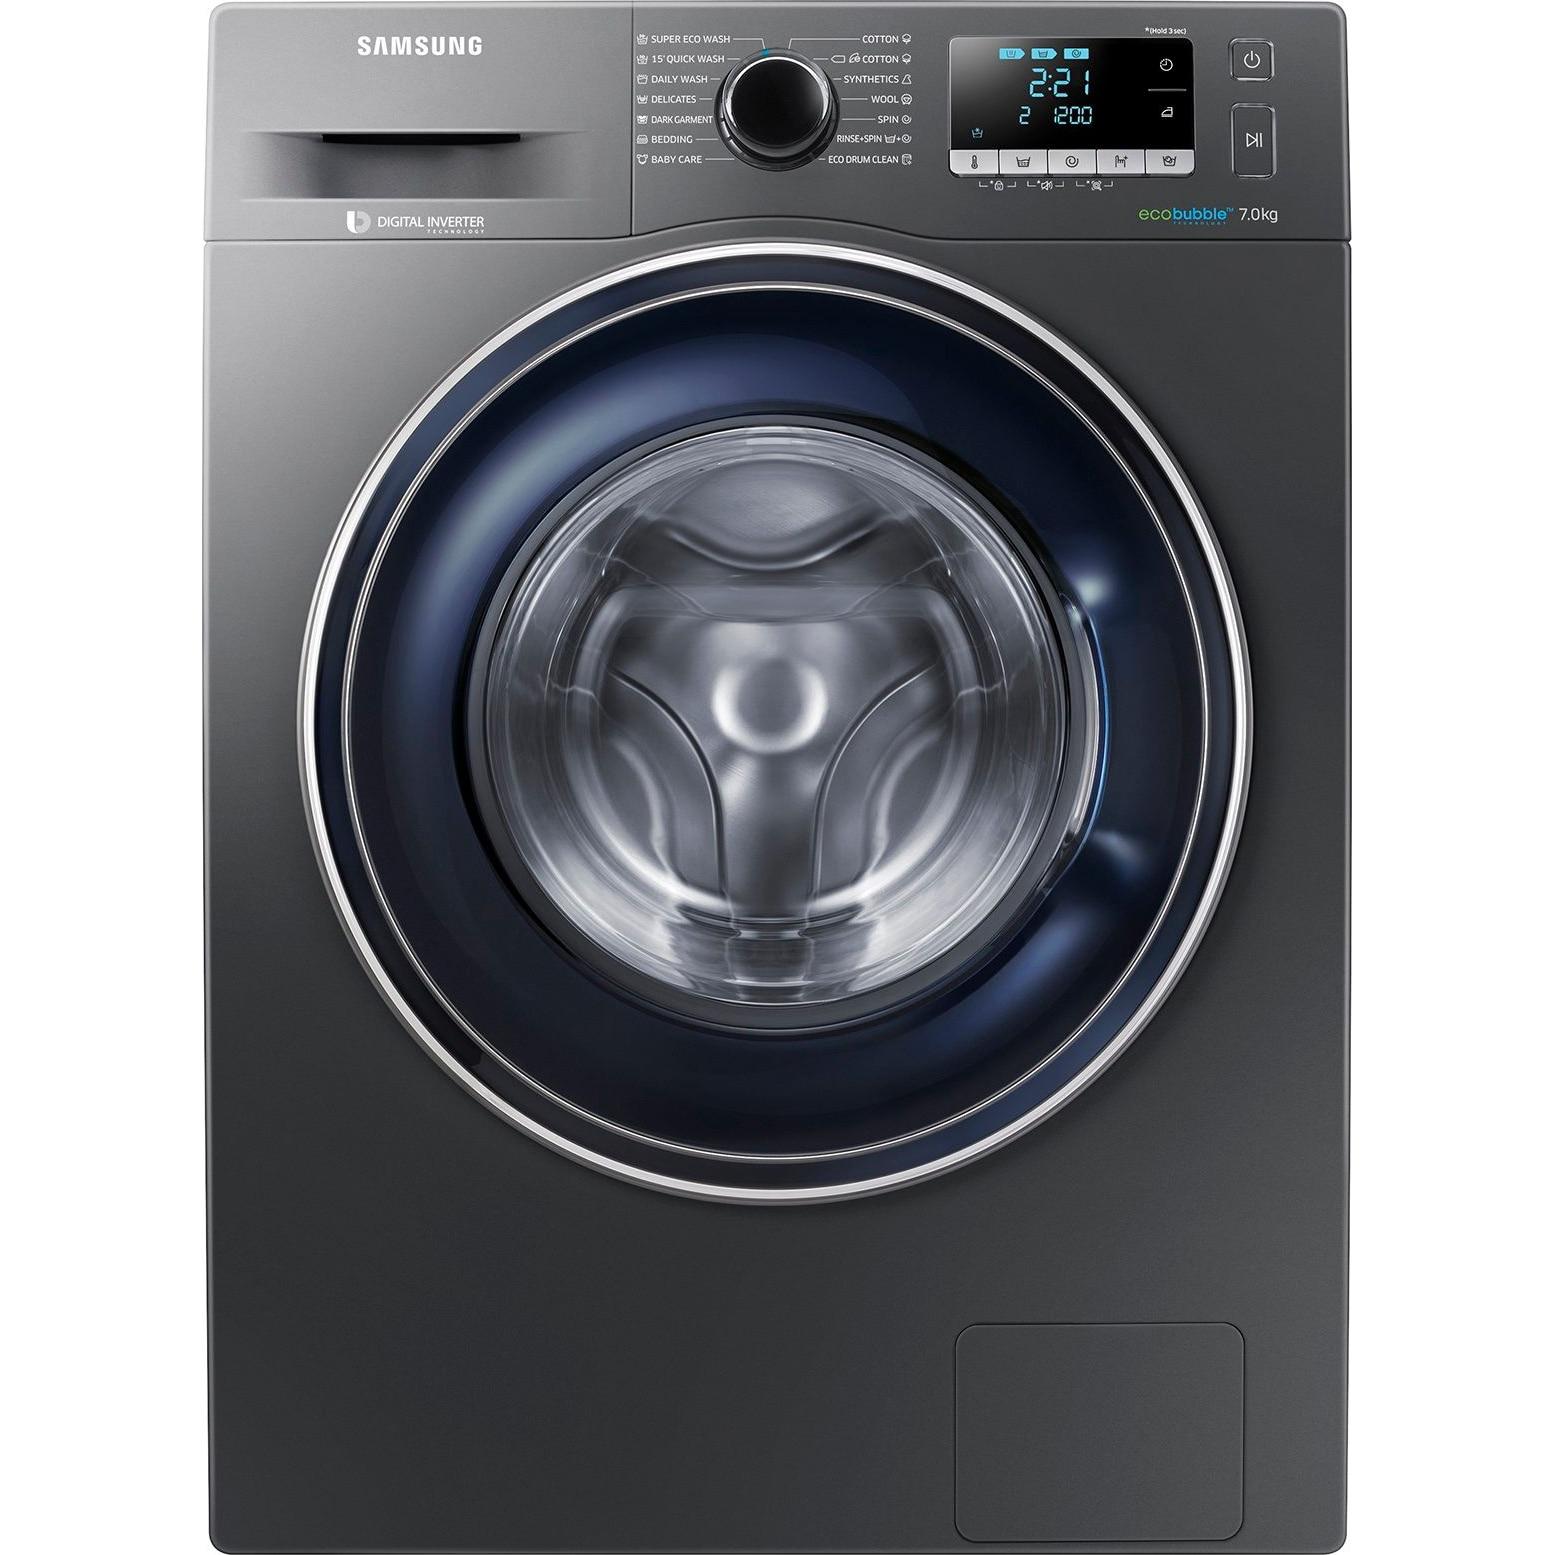 Fotografie Masina de spalat rufe Samsung WW70J5246FX/LE, EcoBubble, Motor Inverter Digital, 7 kg, 1200 RPM, Clasa A+++, 60 cm, Inox